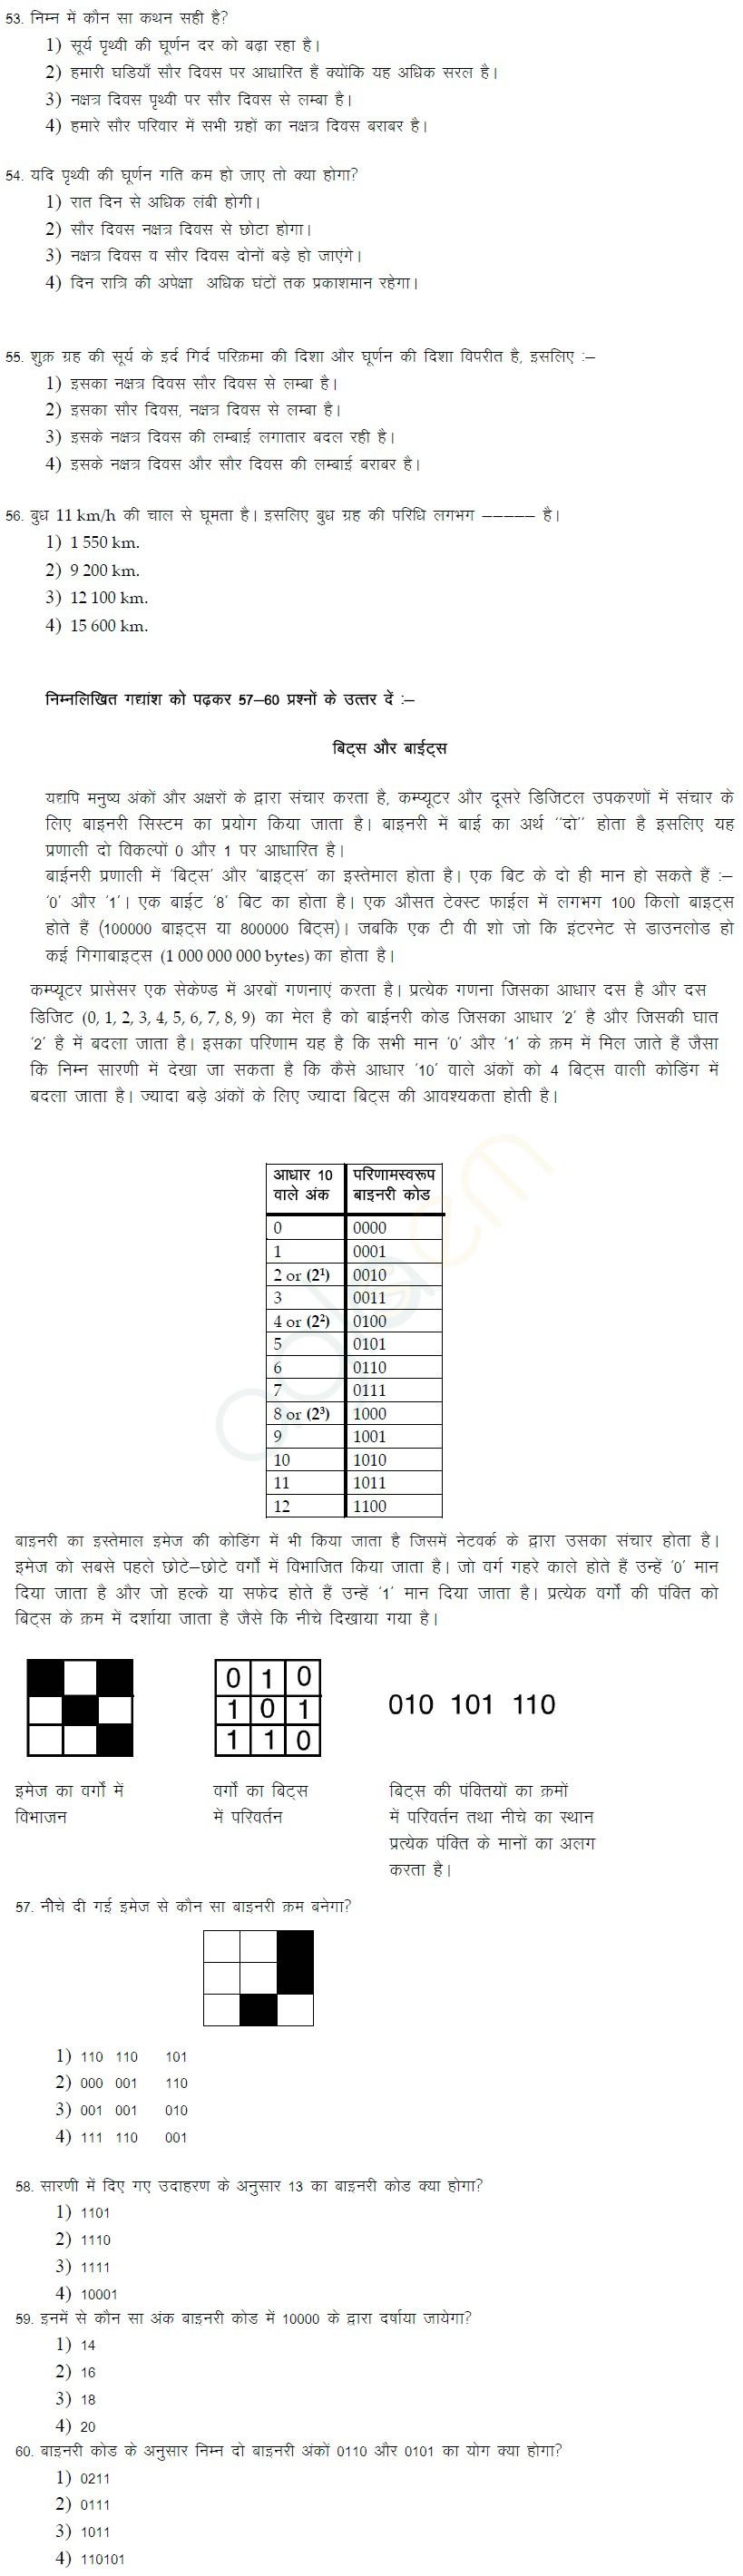 Class XI CBSE Sample Papers 2014 (in Hindi)